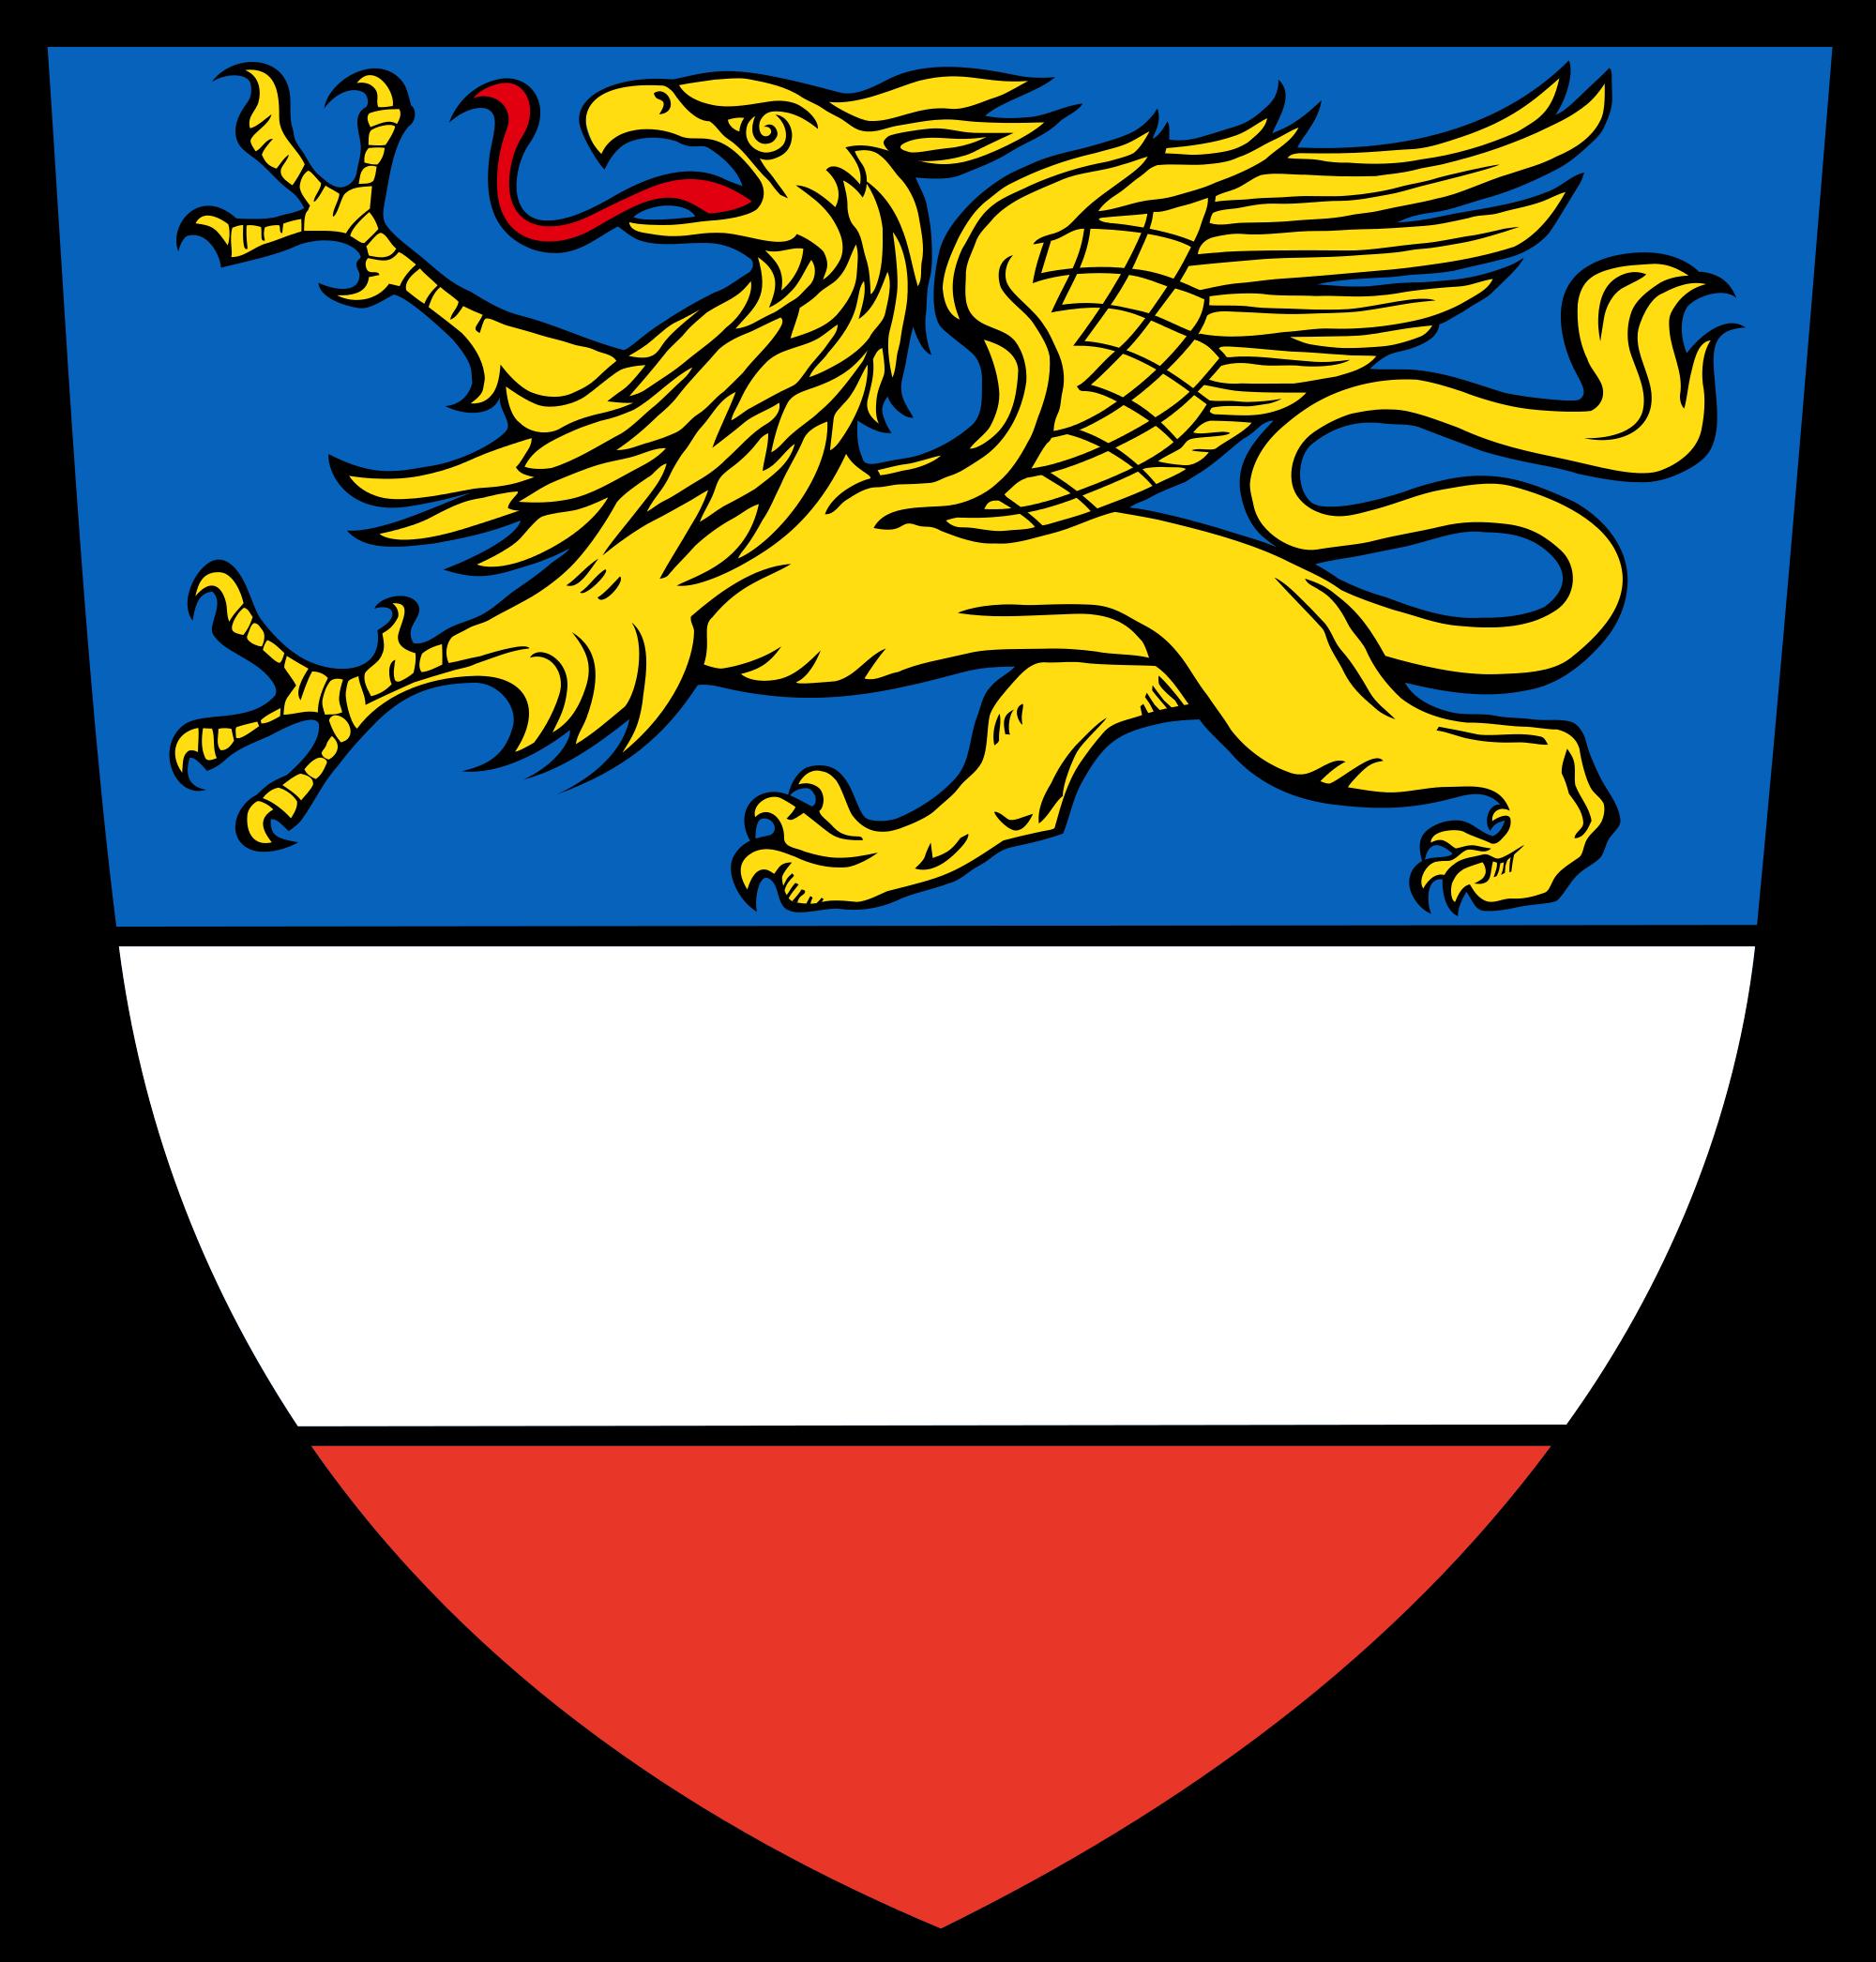 File:Rostock Wappen.svg.